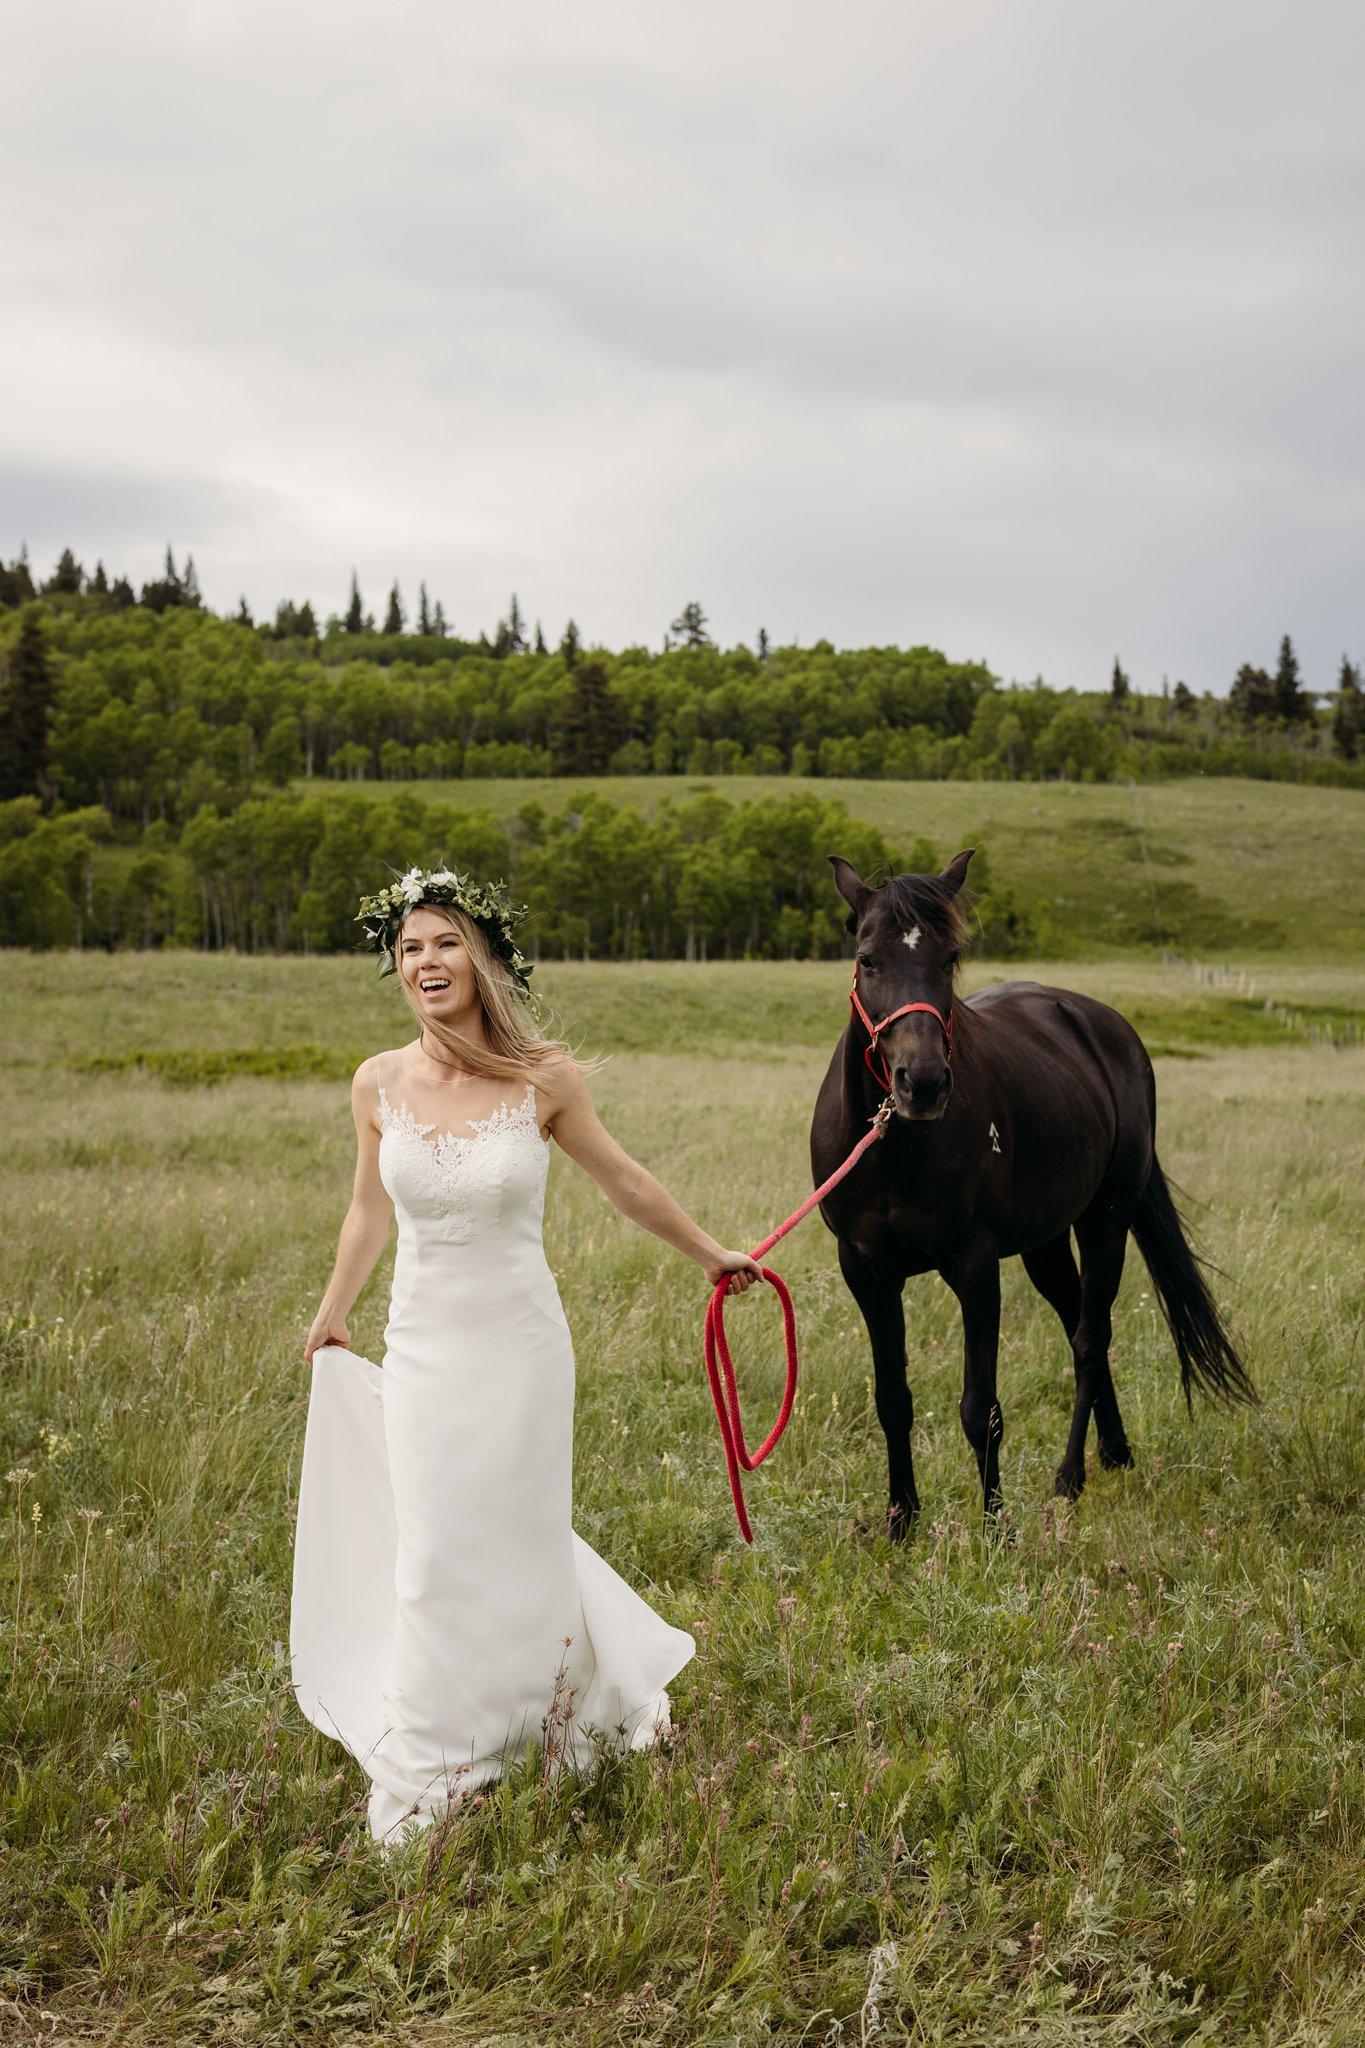 Ashley Daphne Photography,Calgary wedding photographer,Castle Provincial Park,Wedding Photography,arabian racing horse,cabin wedding,rustic wedding,small intimate wedding,wedding photographer,yyc wedding photographer,